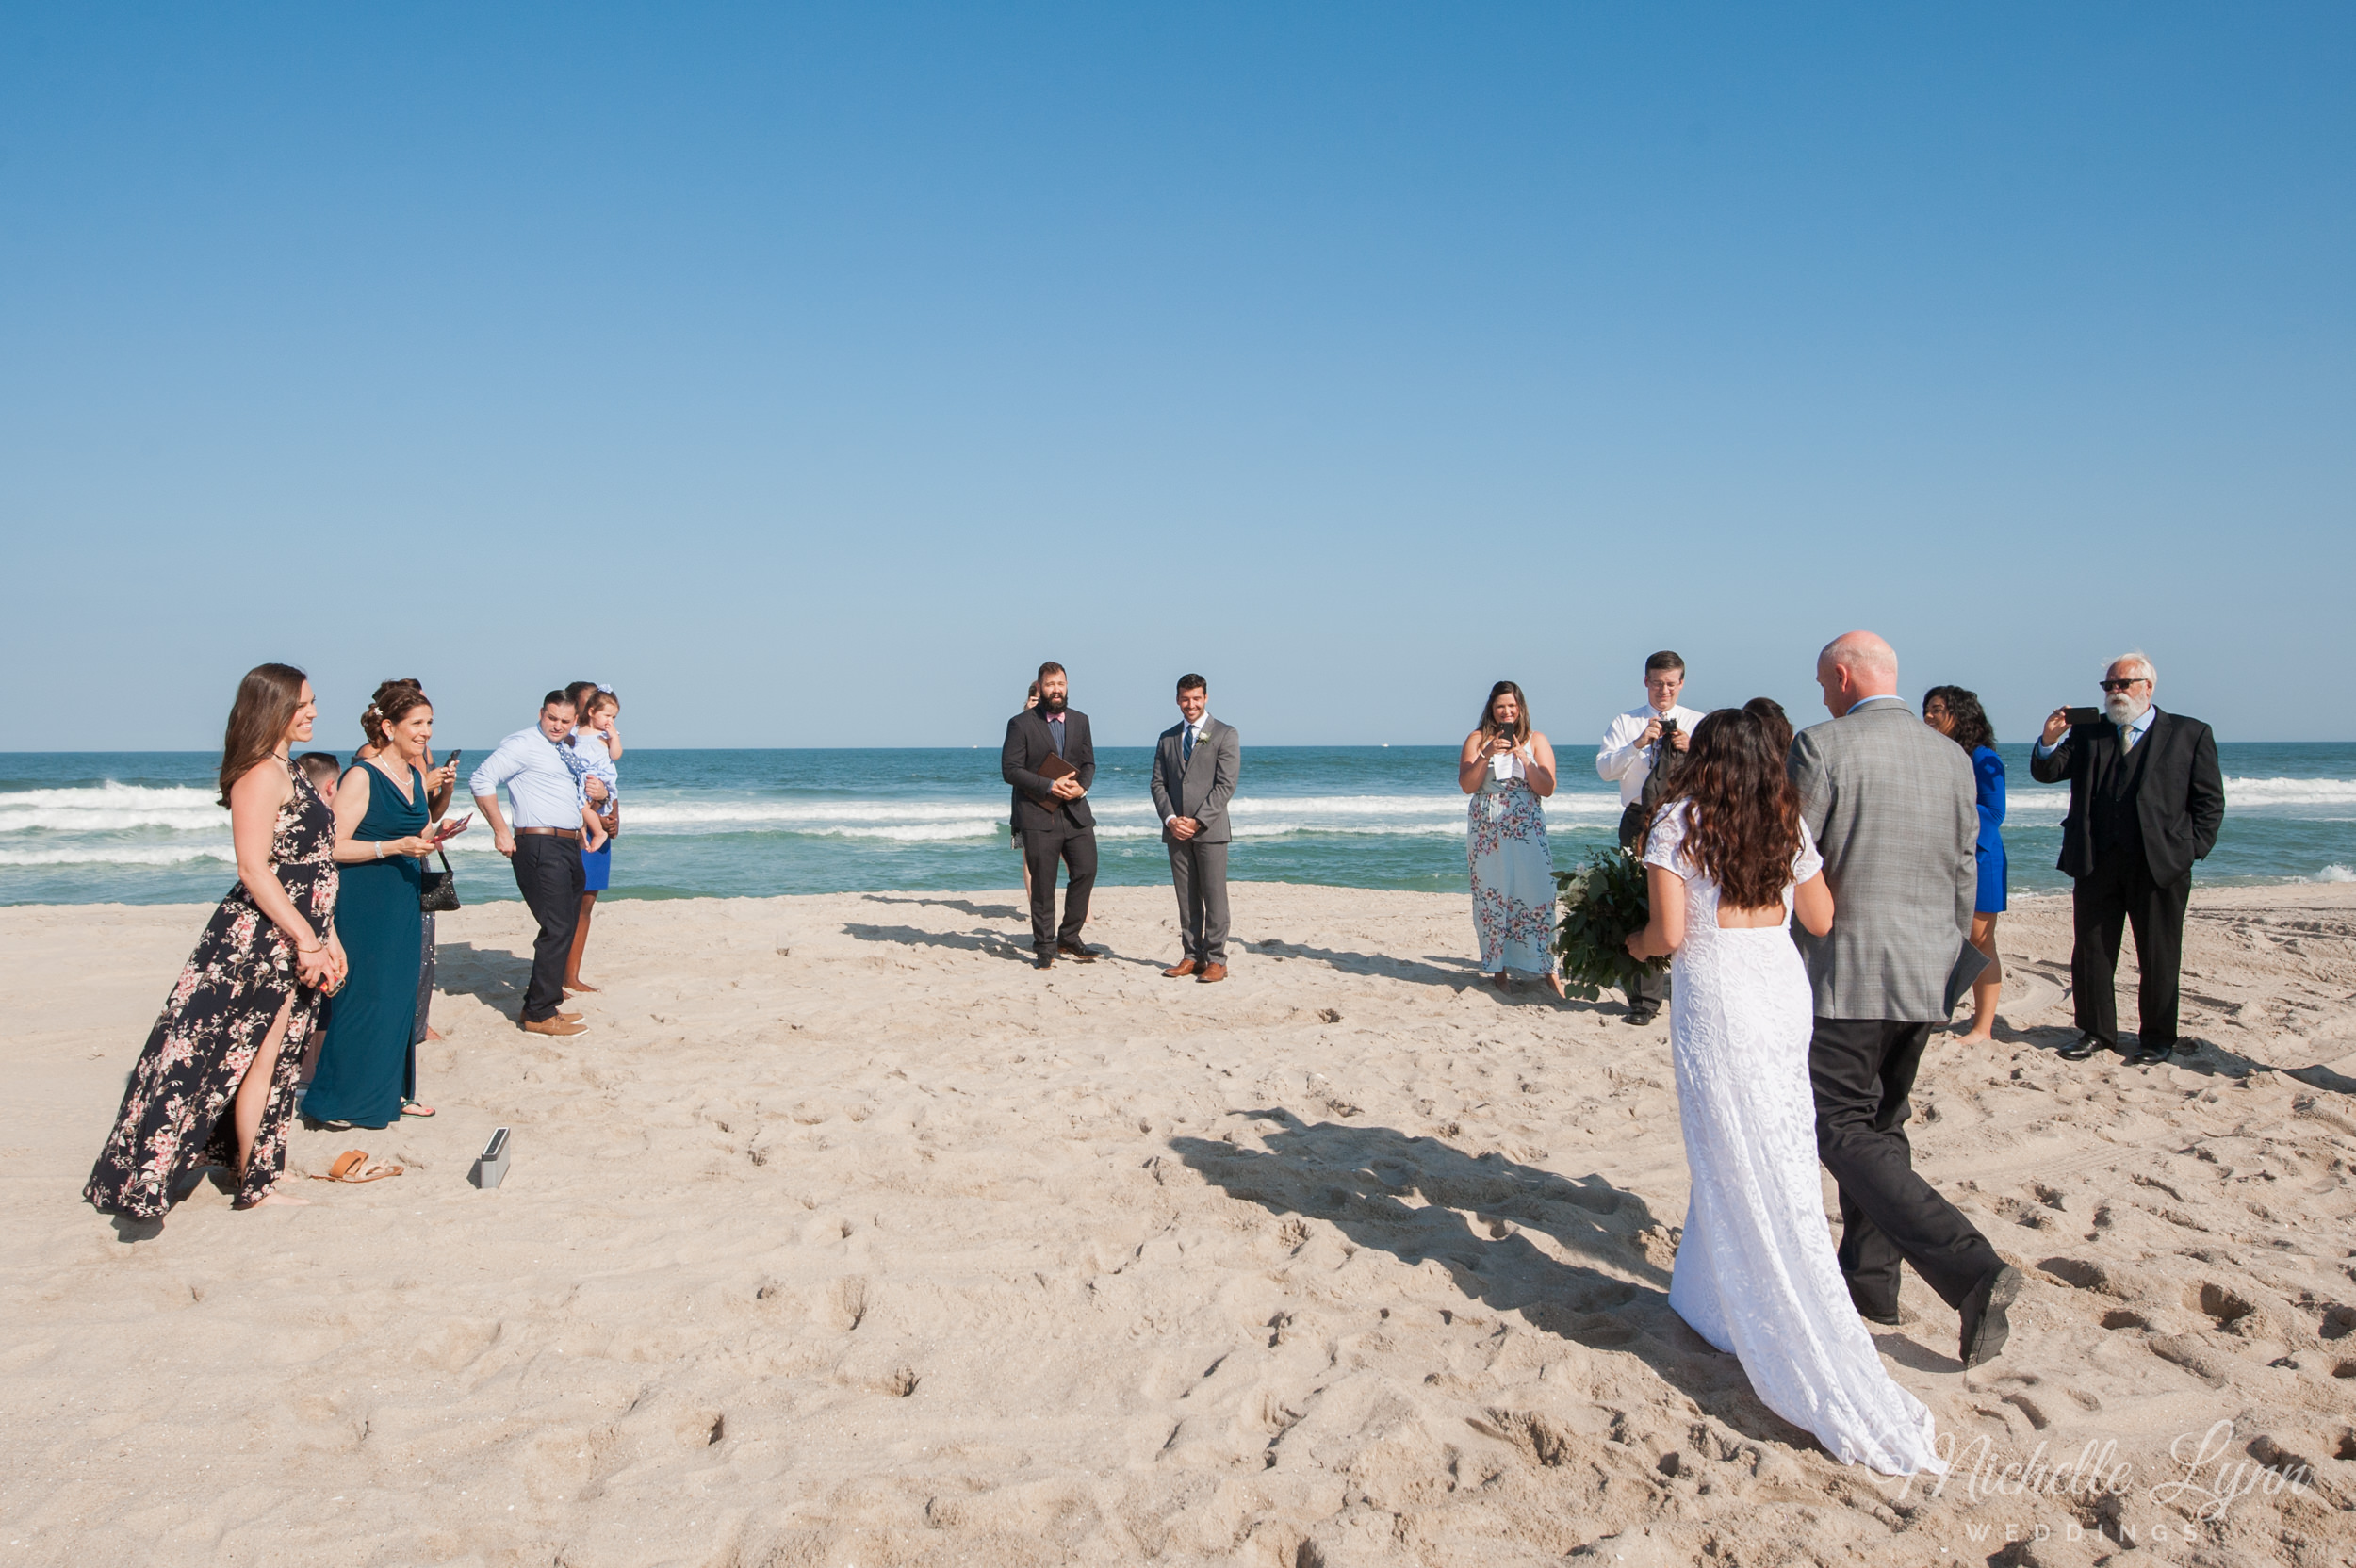 mlw-brant-beach-lbi-wedding-photography-13.jpg